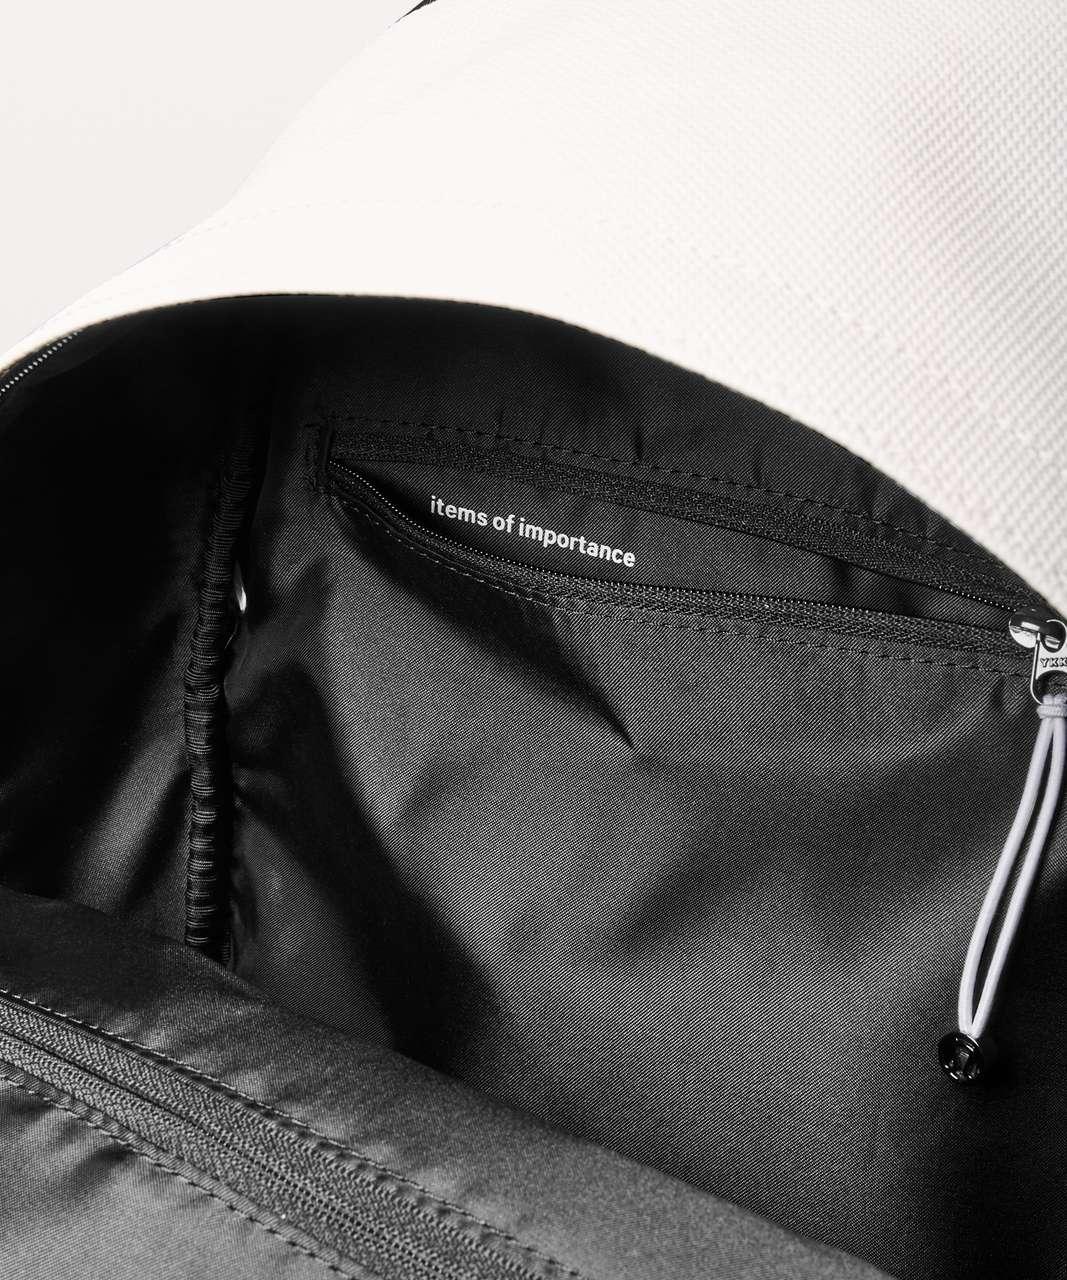 Lululemon Everywhere Backpack *17L - White / Black